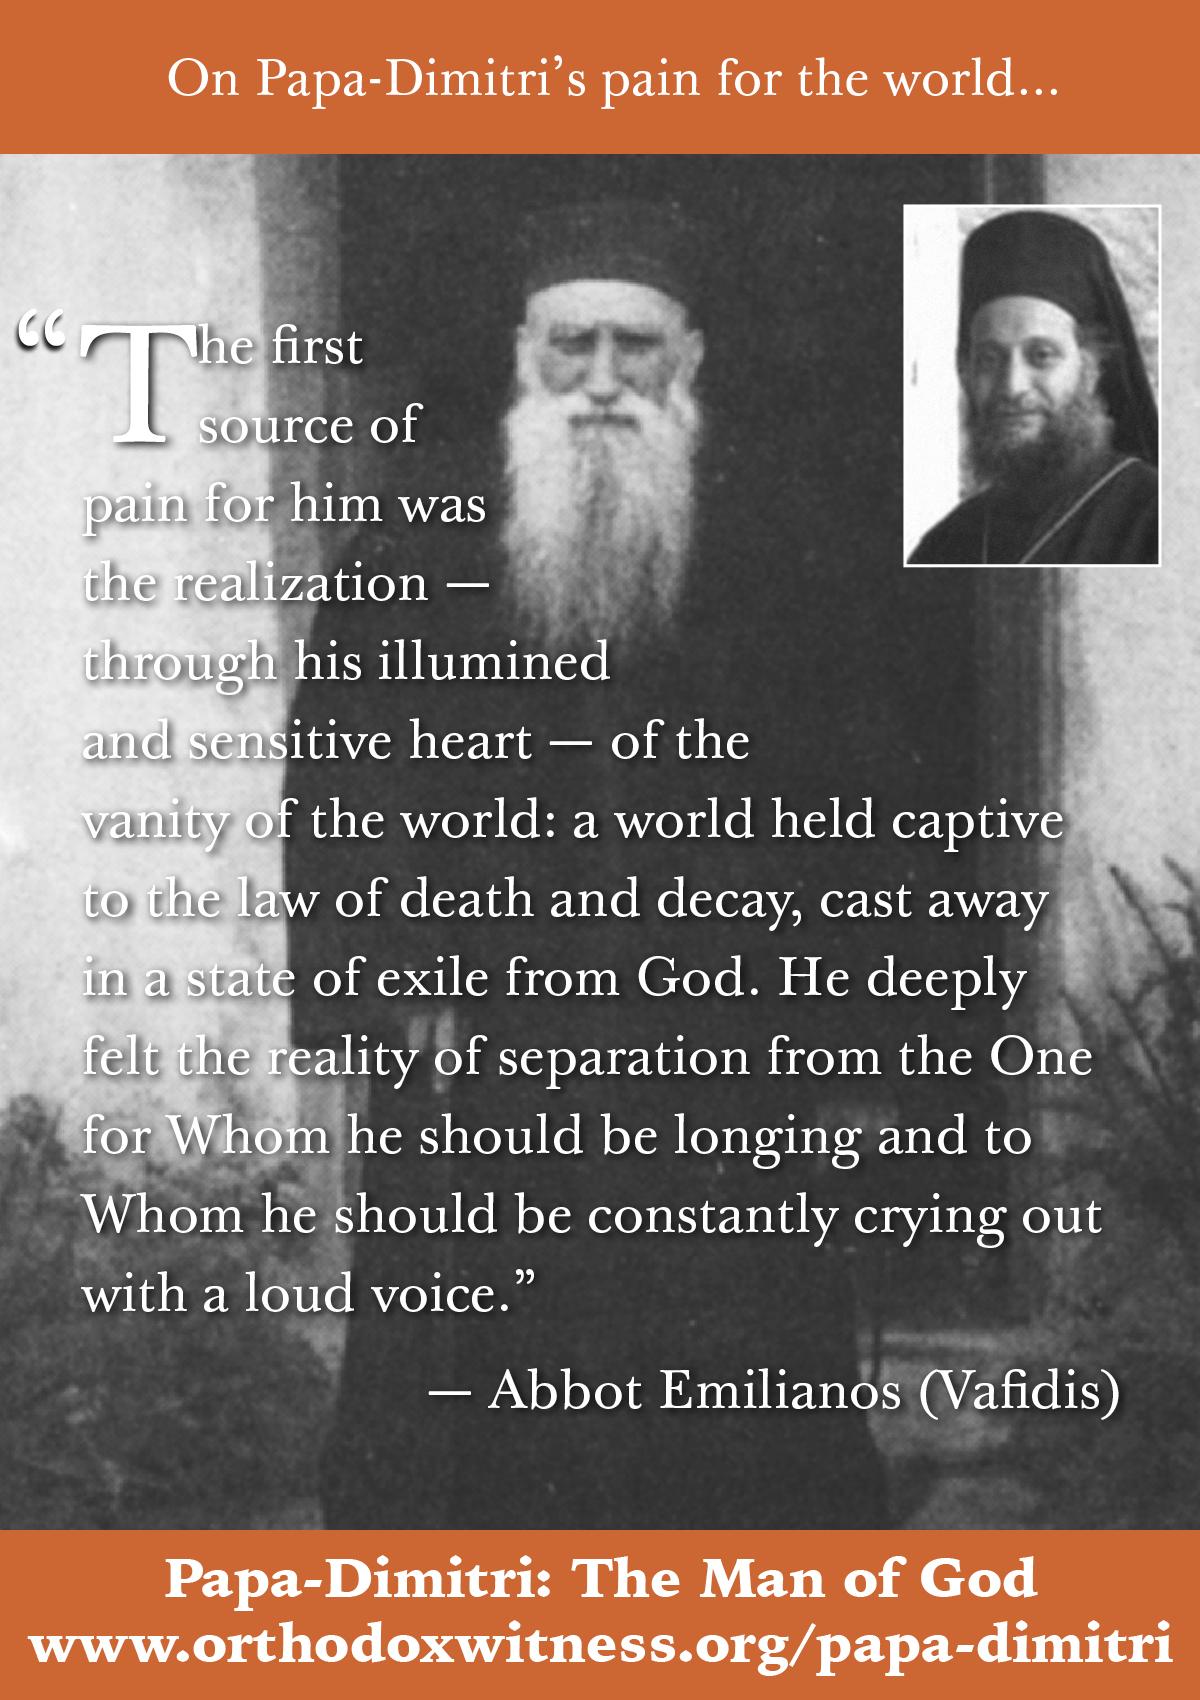 pd-abbot-emilianos-4